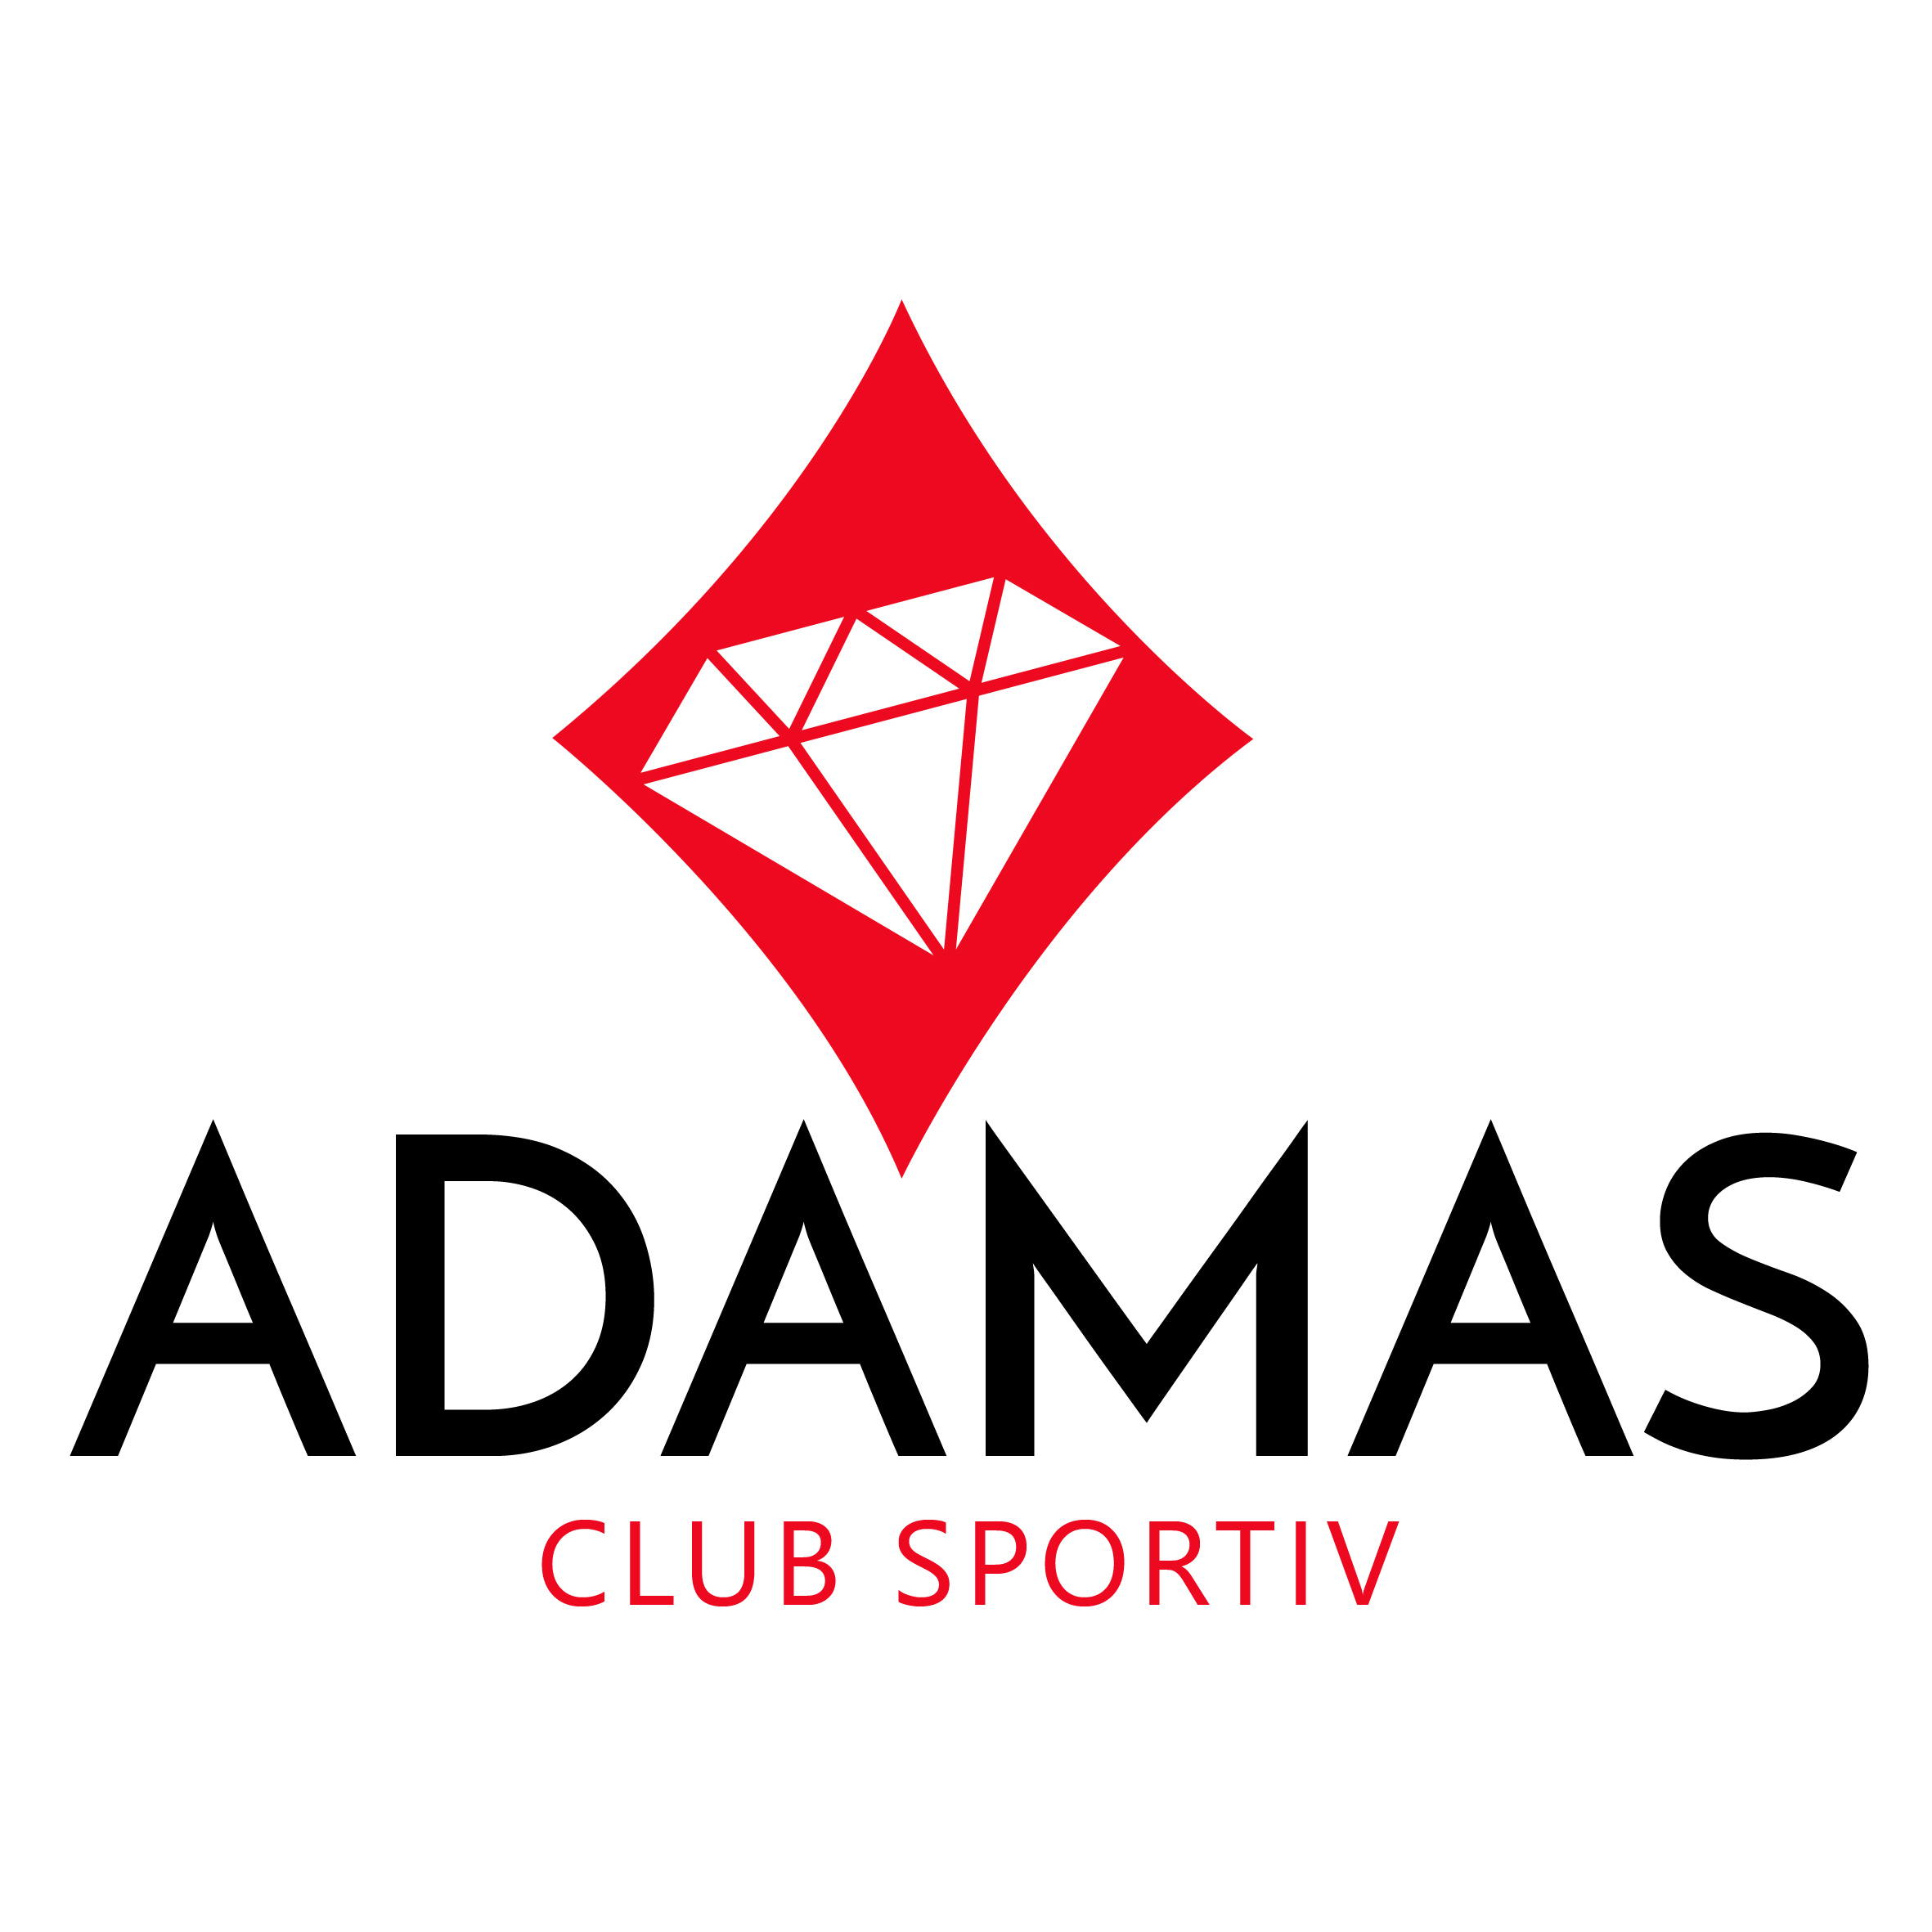 Asociatia Club Sportiv Adamas Bacau logo